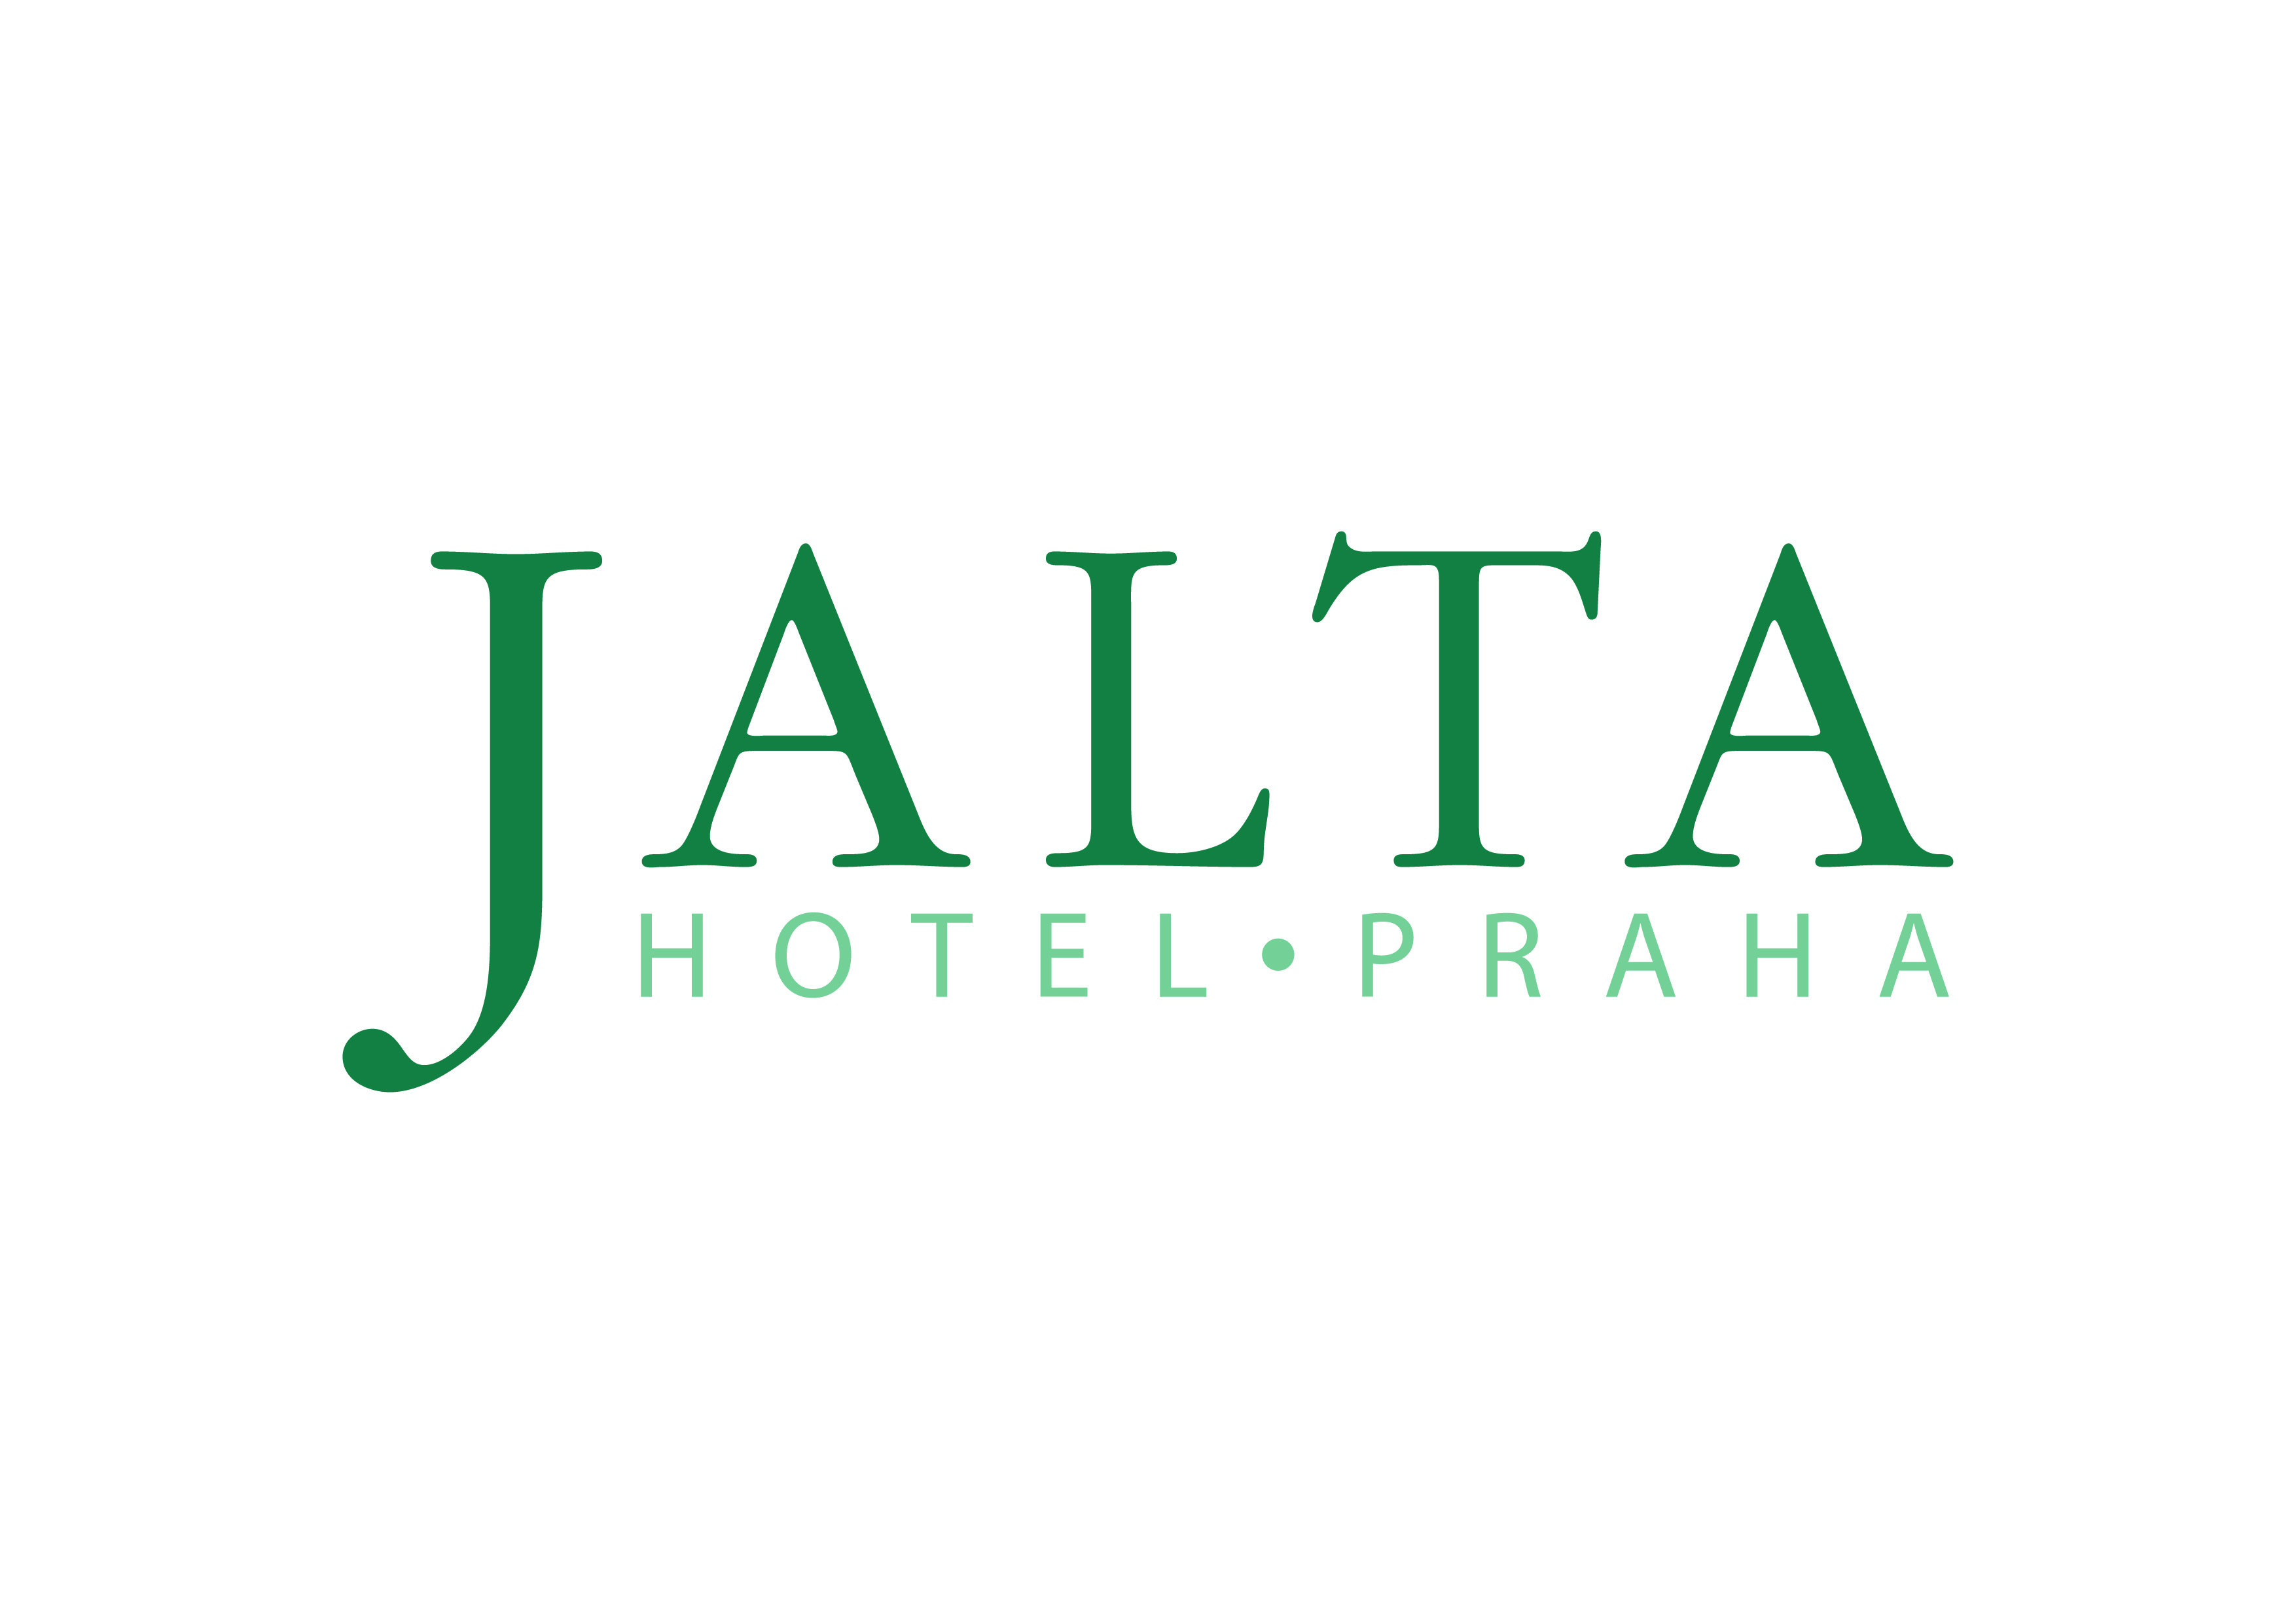 www.hoteljalta.com - logo